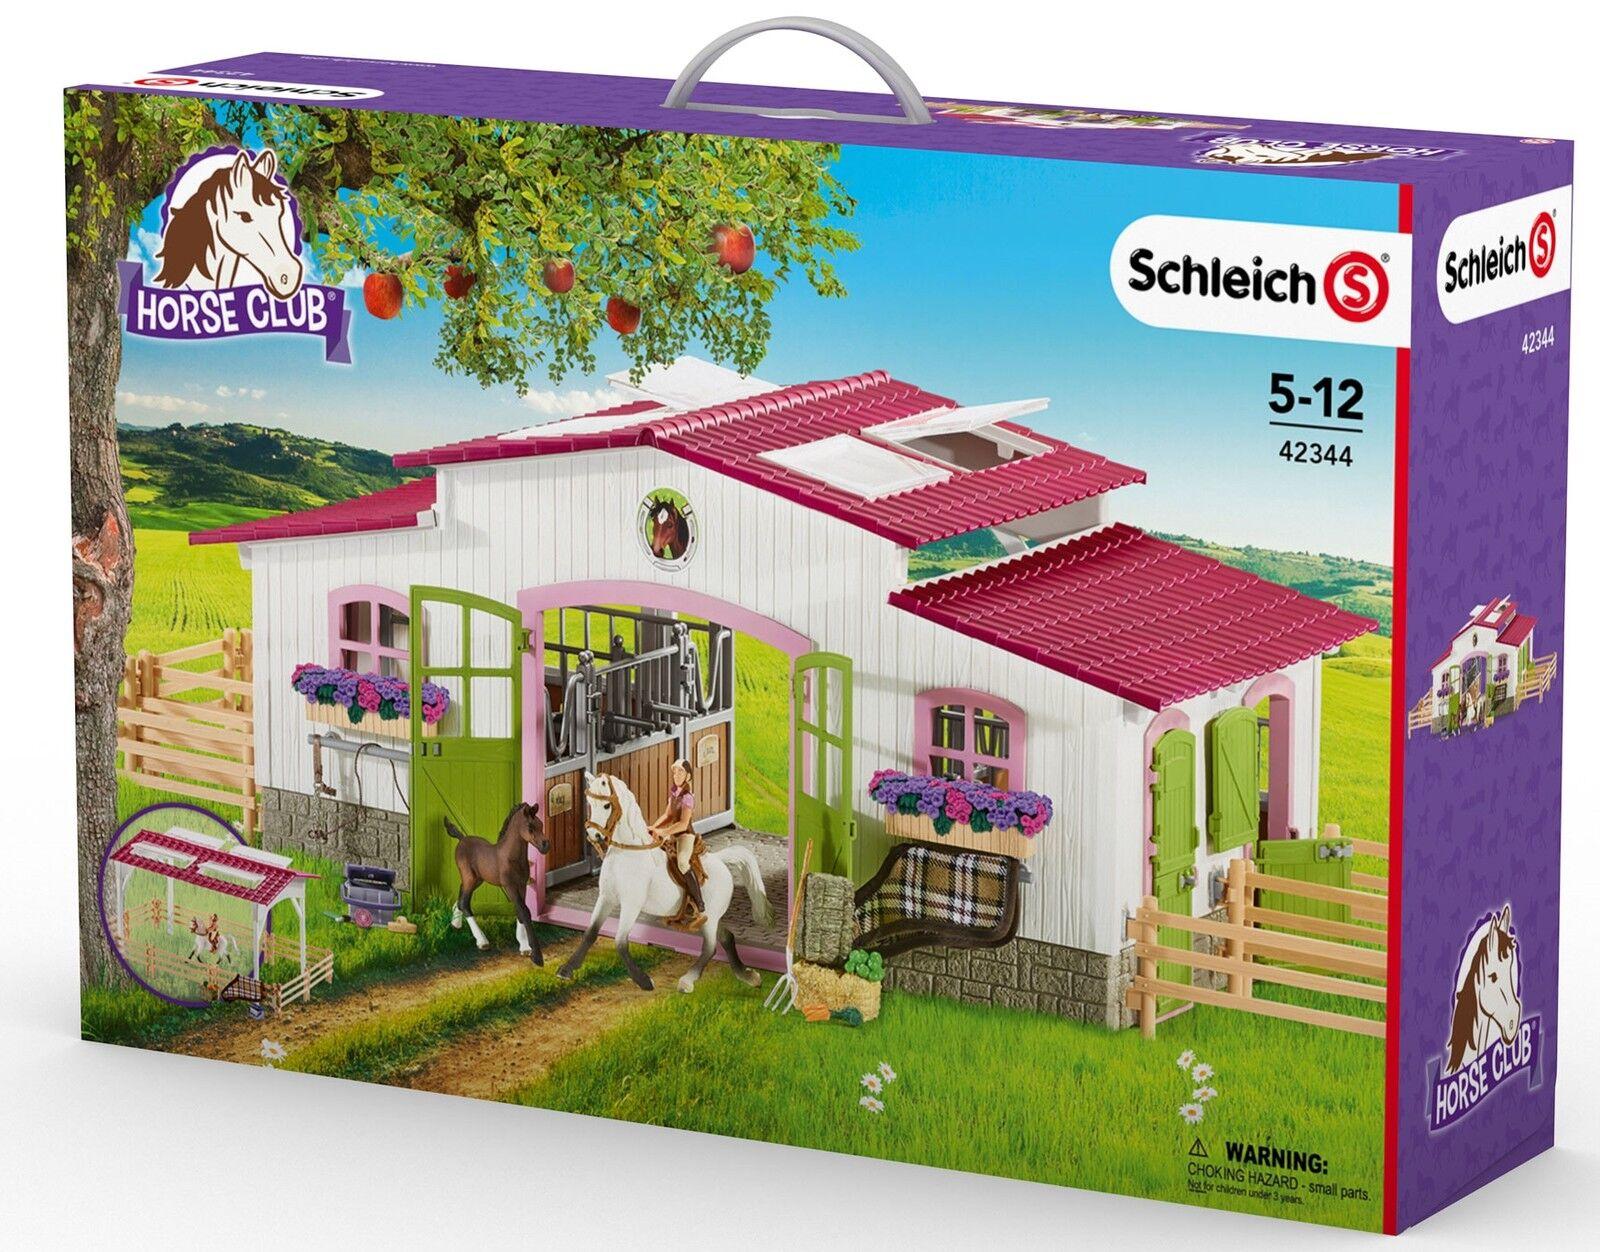 Schleich 42344 Reiterhof con charra y caballos-cuadra pferdehof nuevo